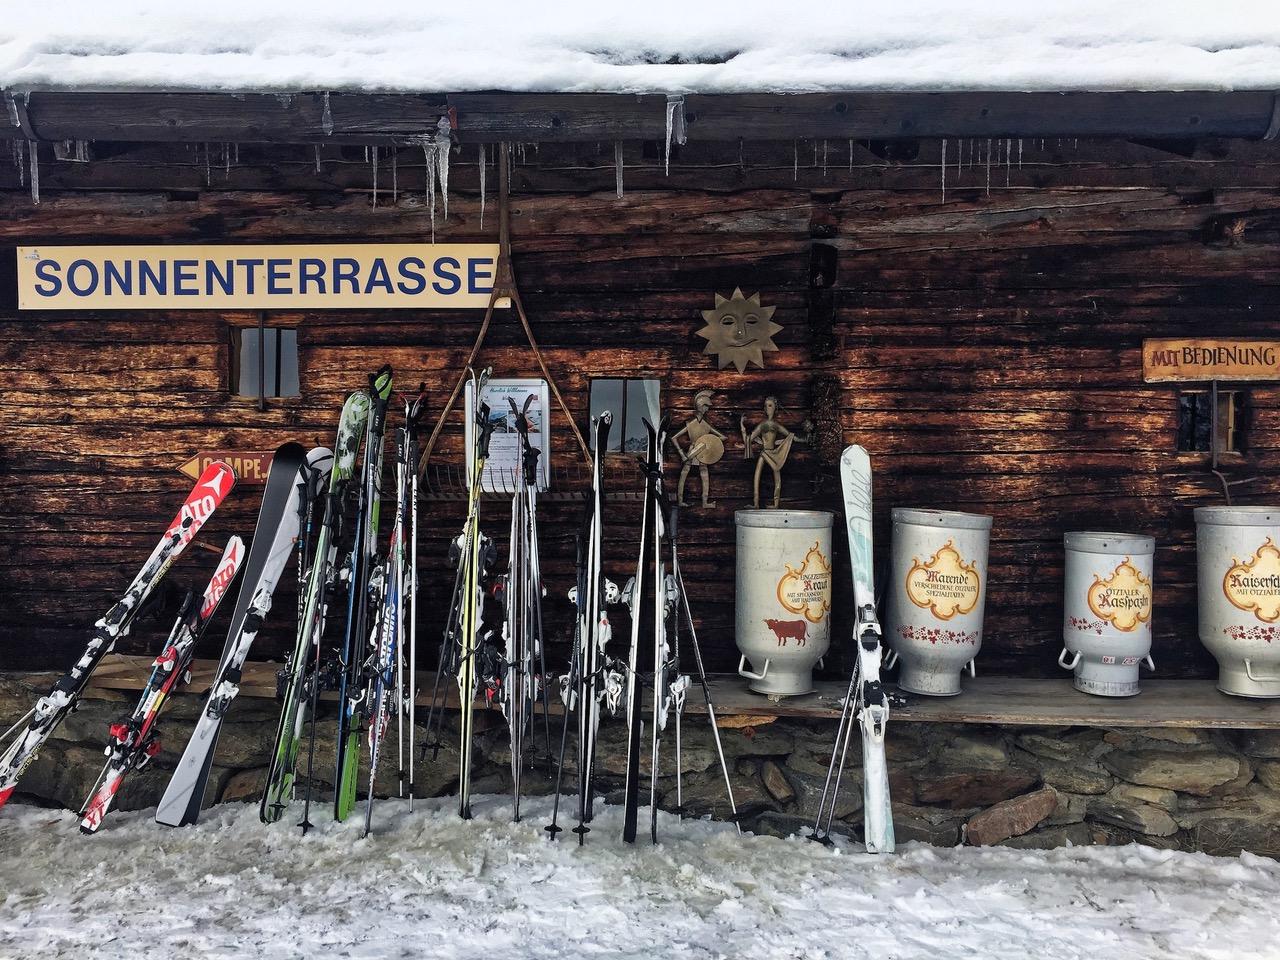 Ski Hut sonneterrasse Sölden Austria